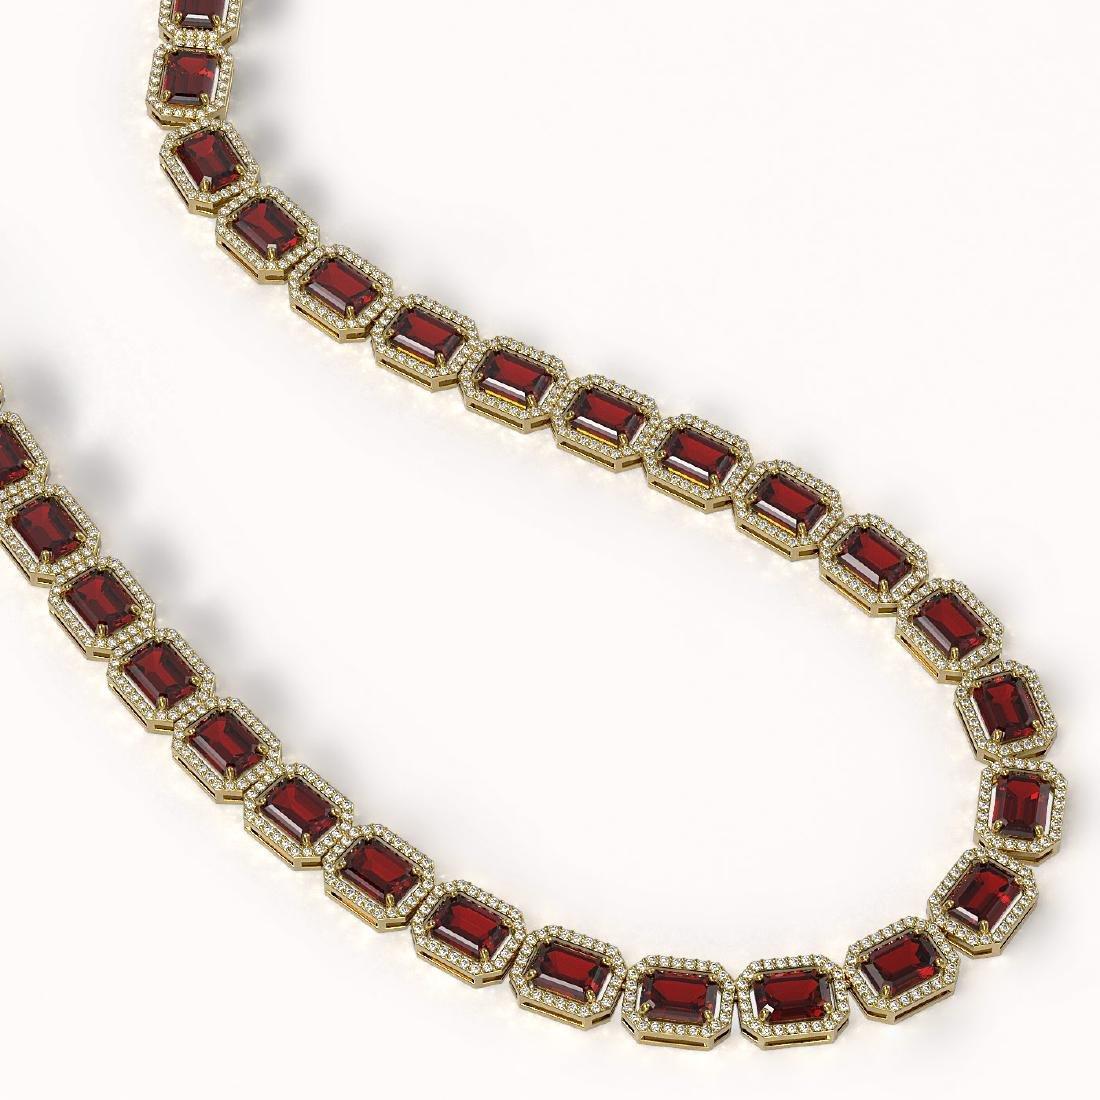 60.59 CTW Garnet & Diamond Halo Necklace 10K Yellow - 2